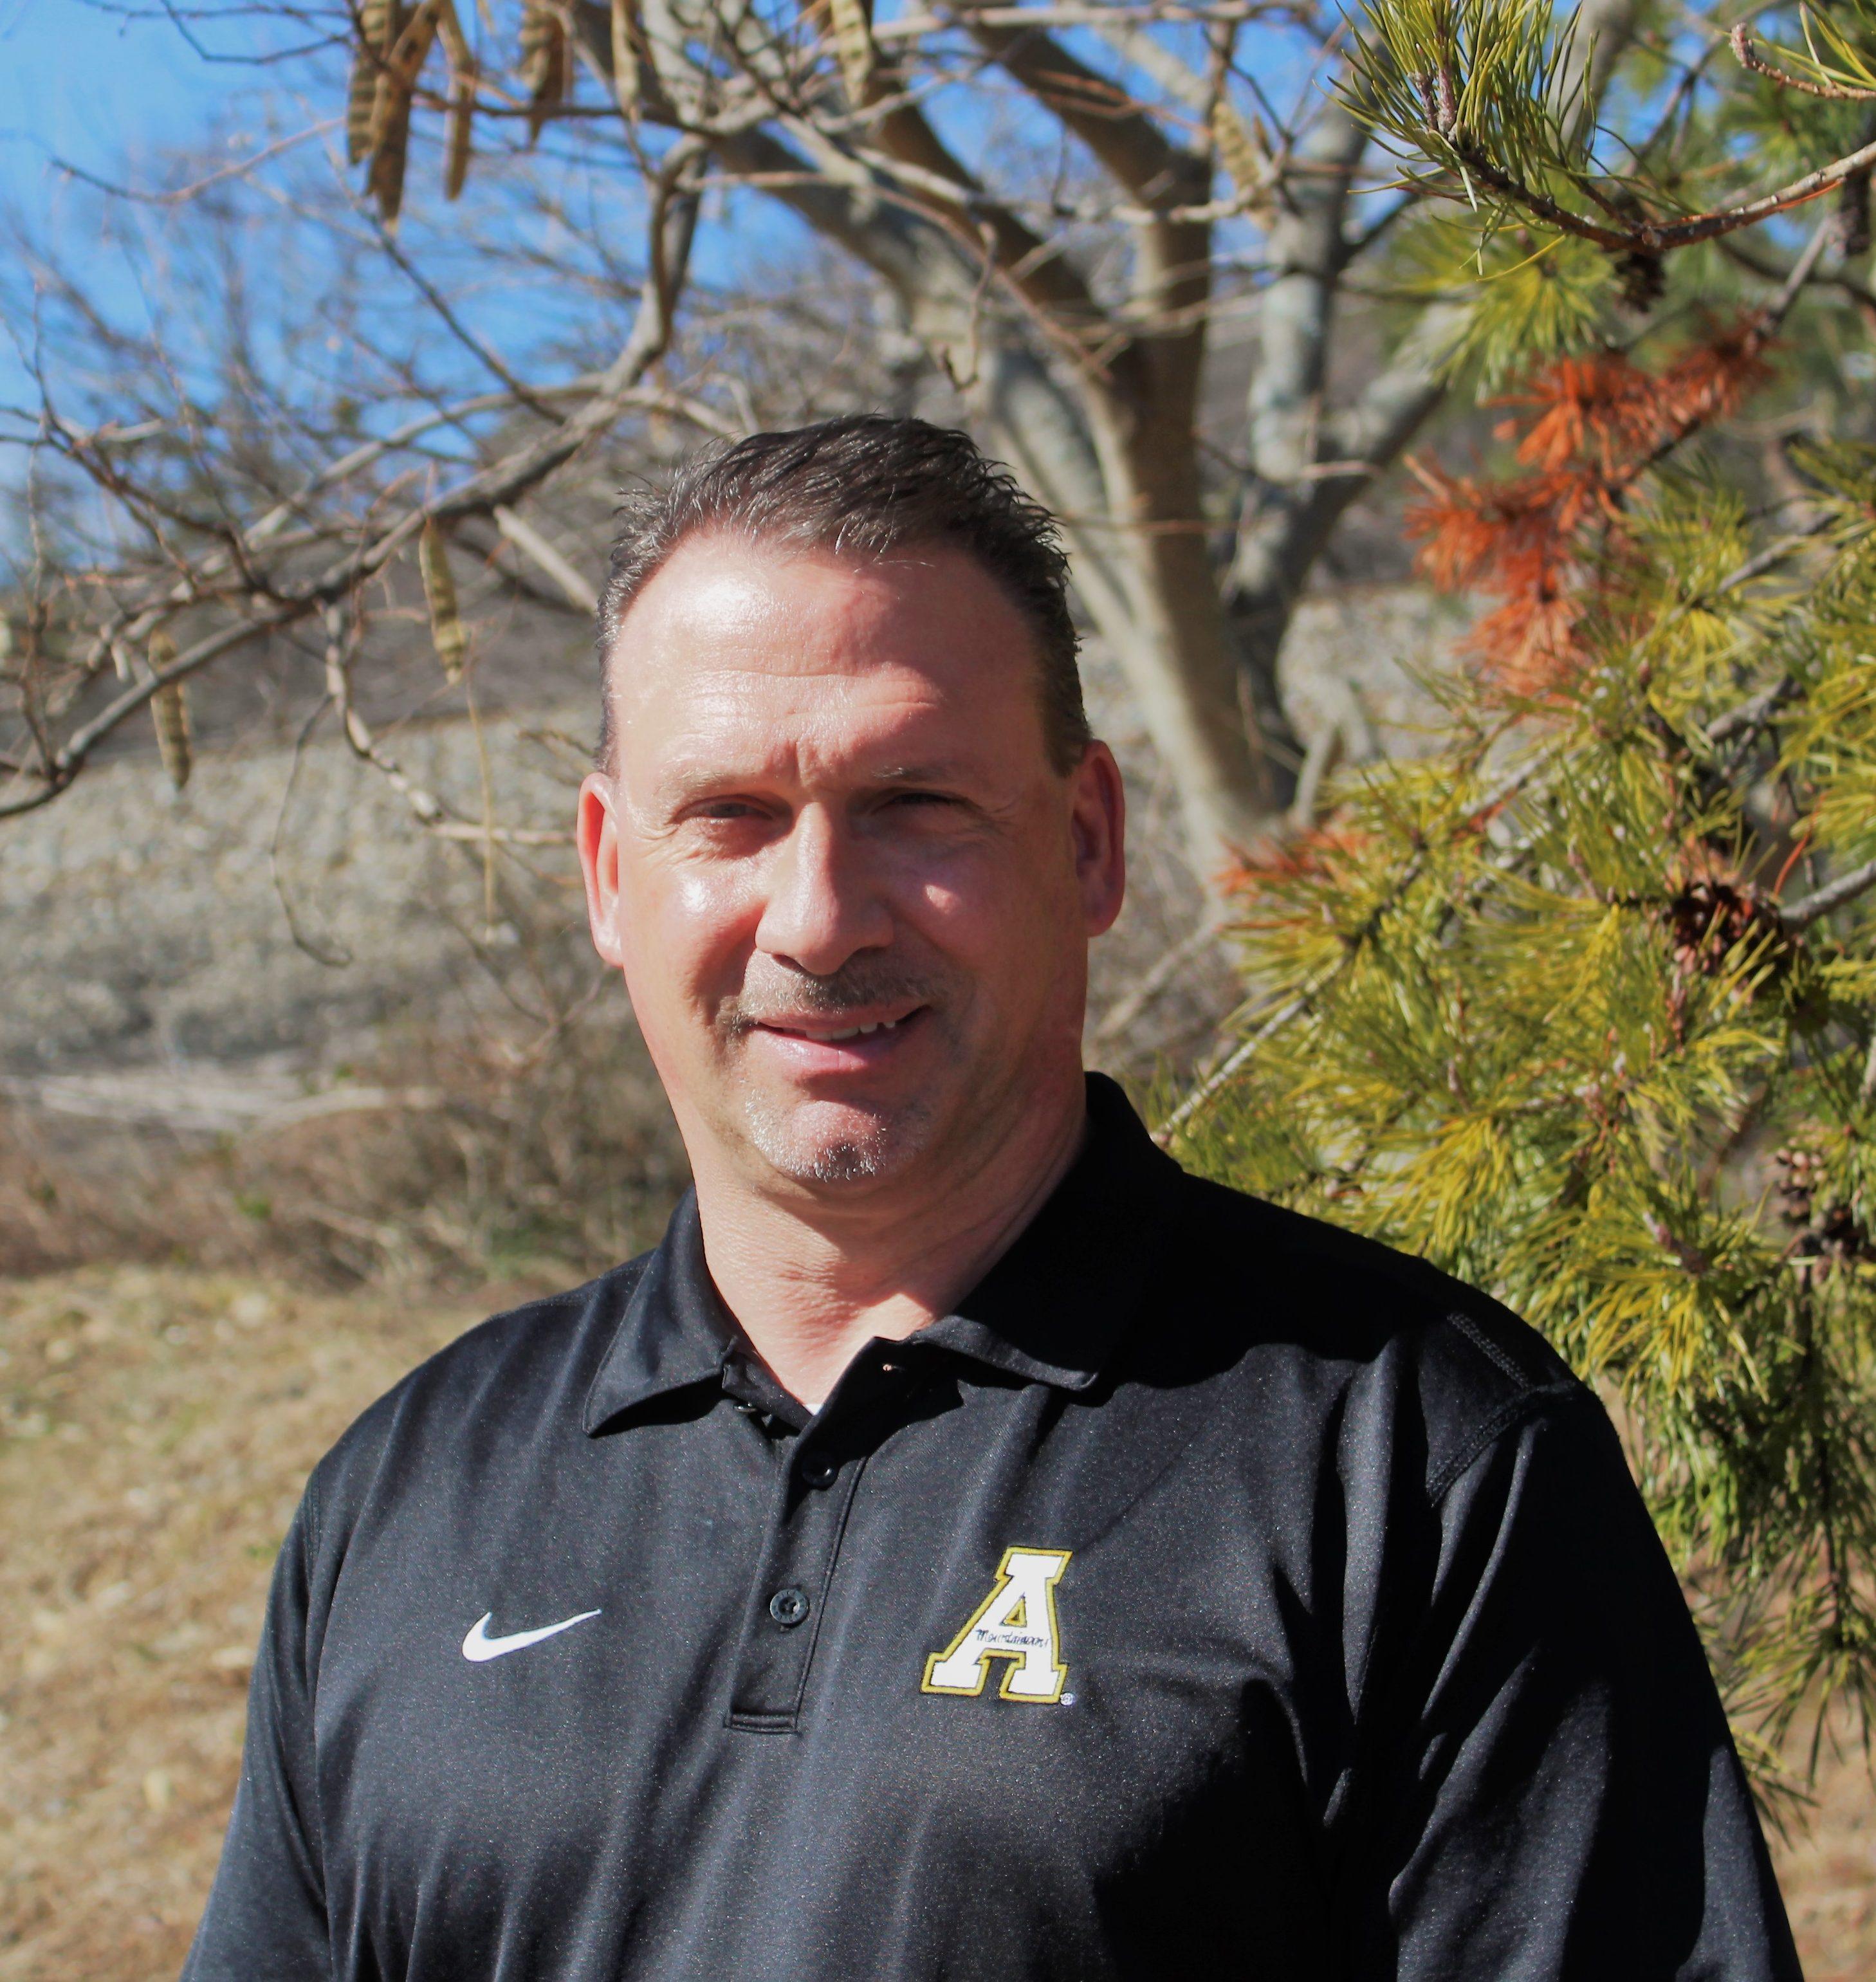 Skip Brewer of Walnut Cove Builders, LLC